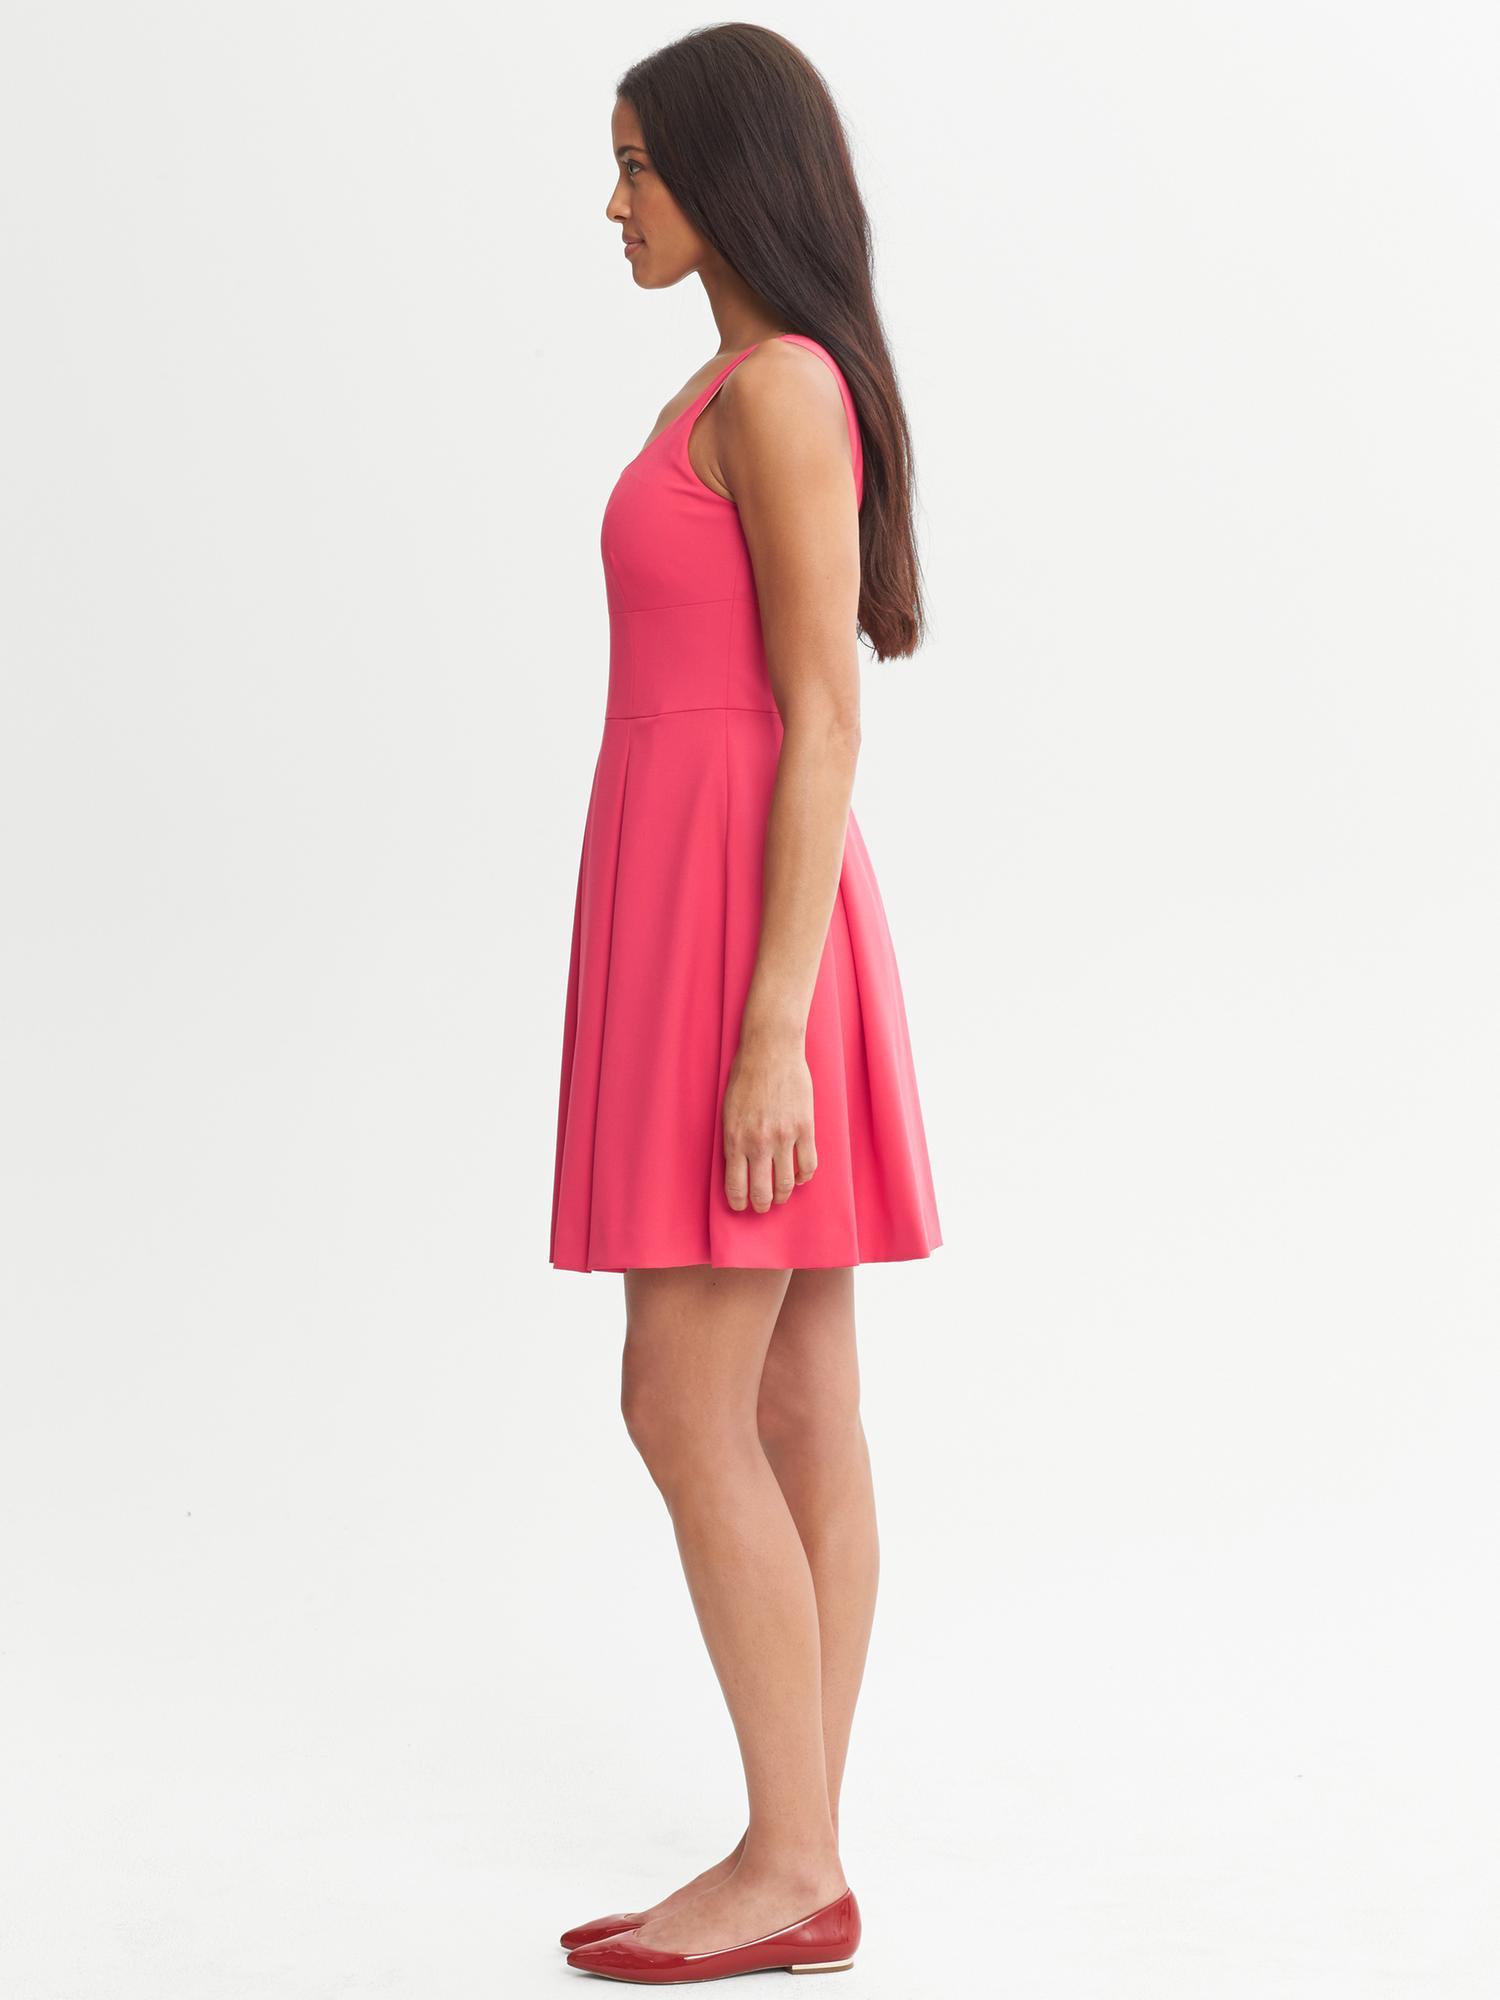 67f118f2067 Lyst - Banana Republic Br Monogram Pleated Dress in Pink